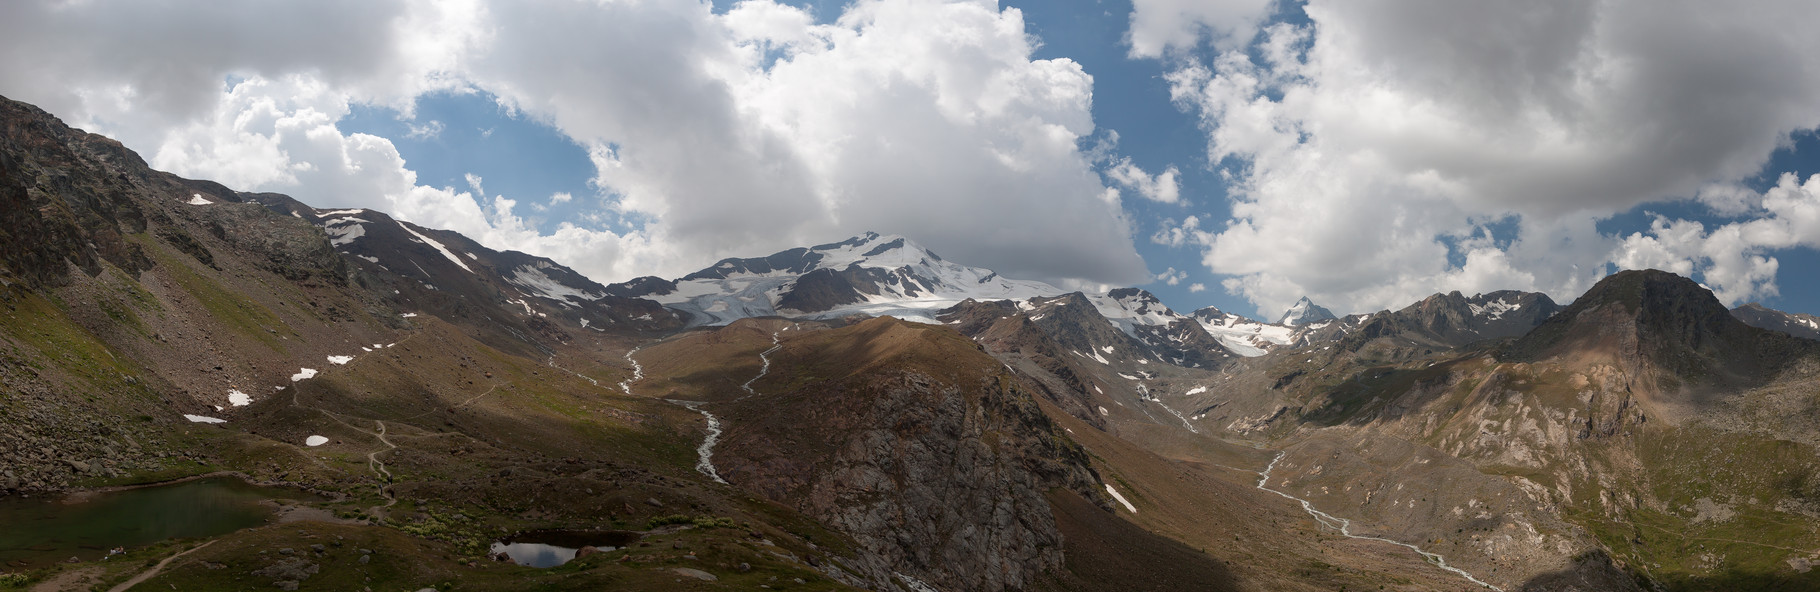 Gran Zebru - Monte Cevedale (IT)